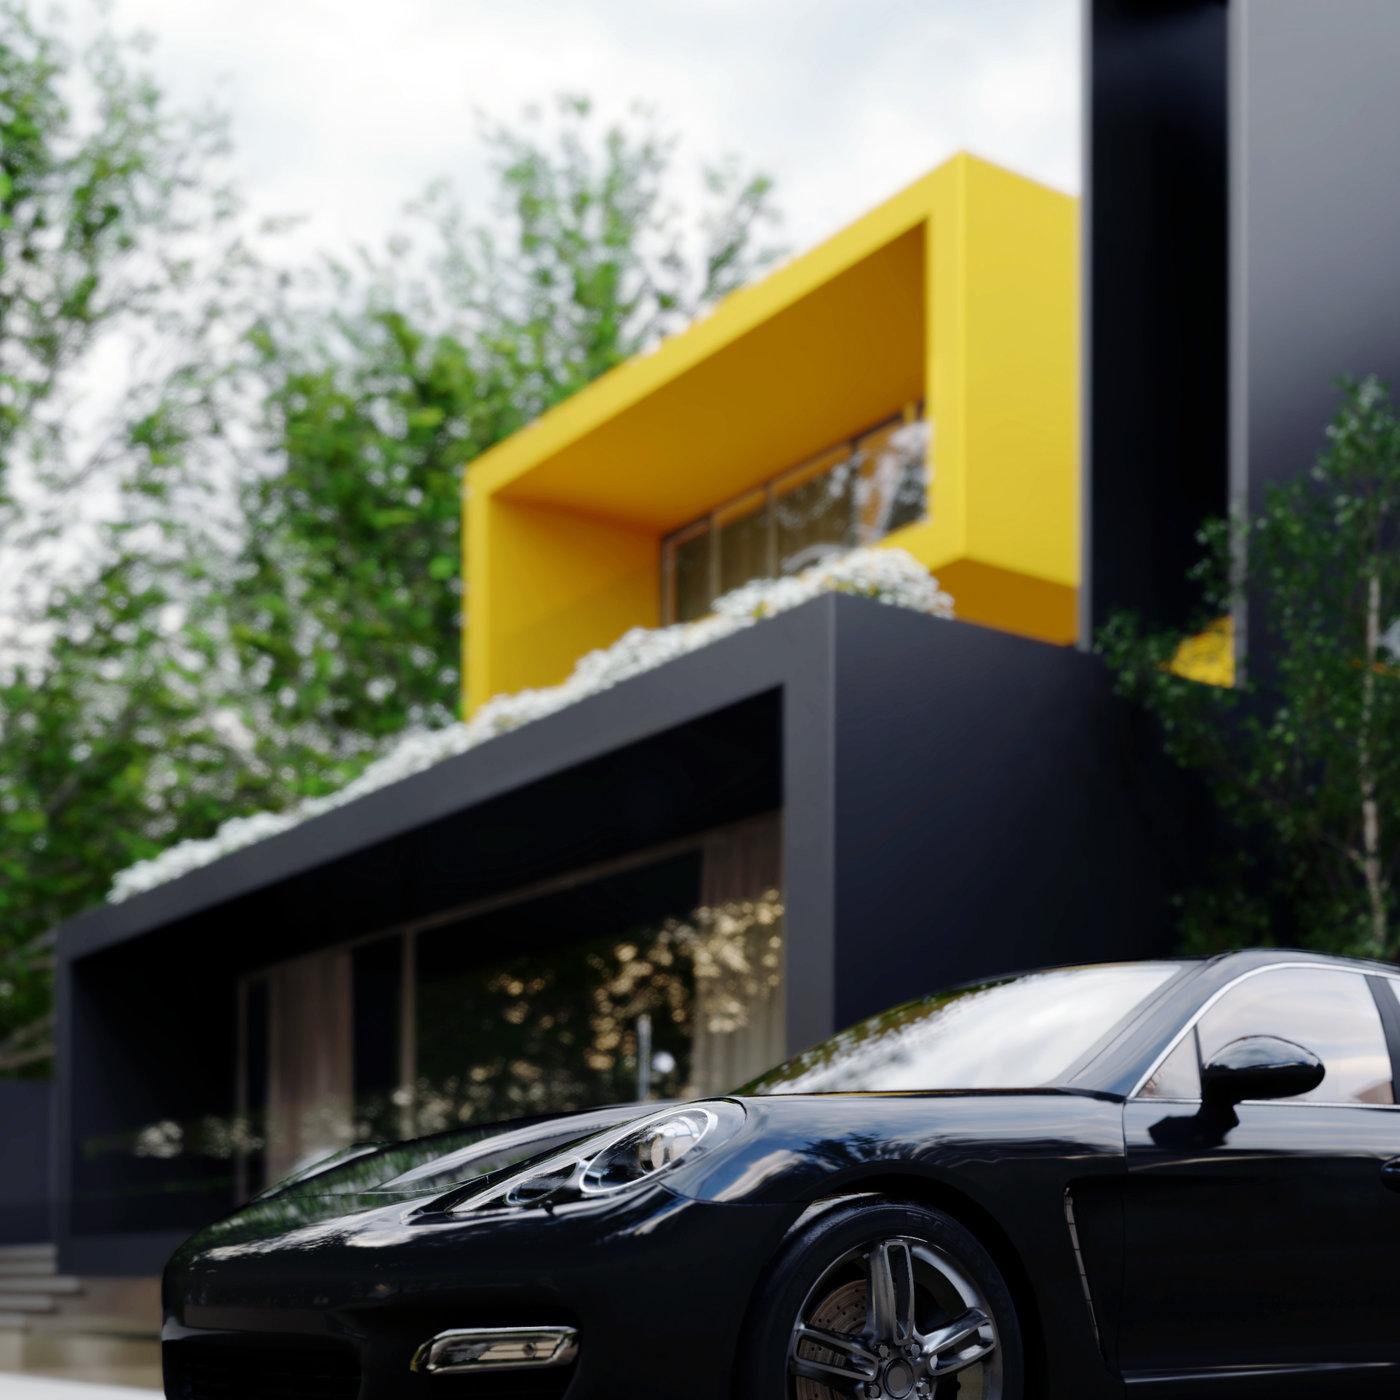 Villa Yellow cube